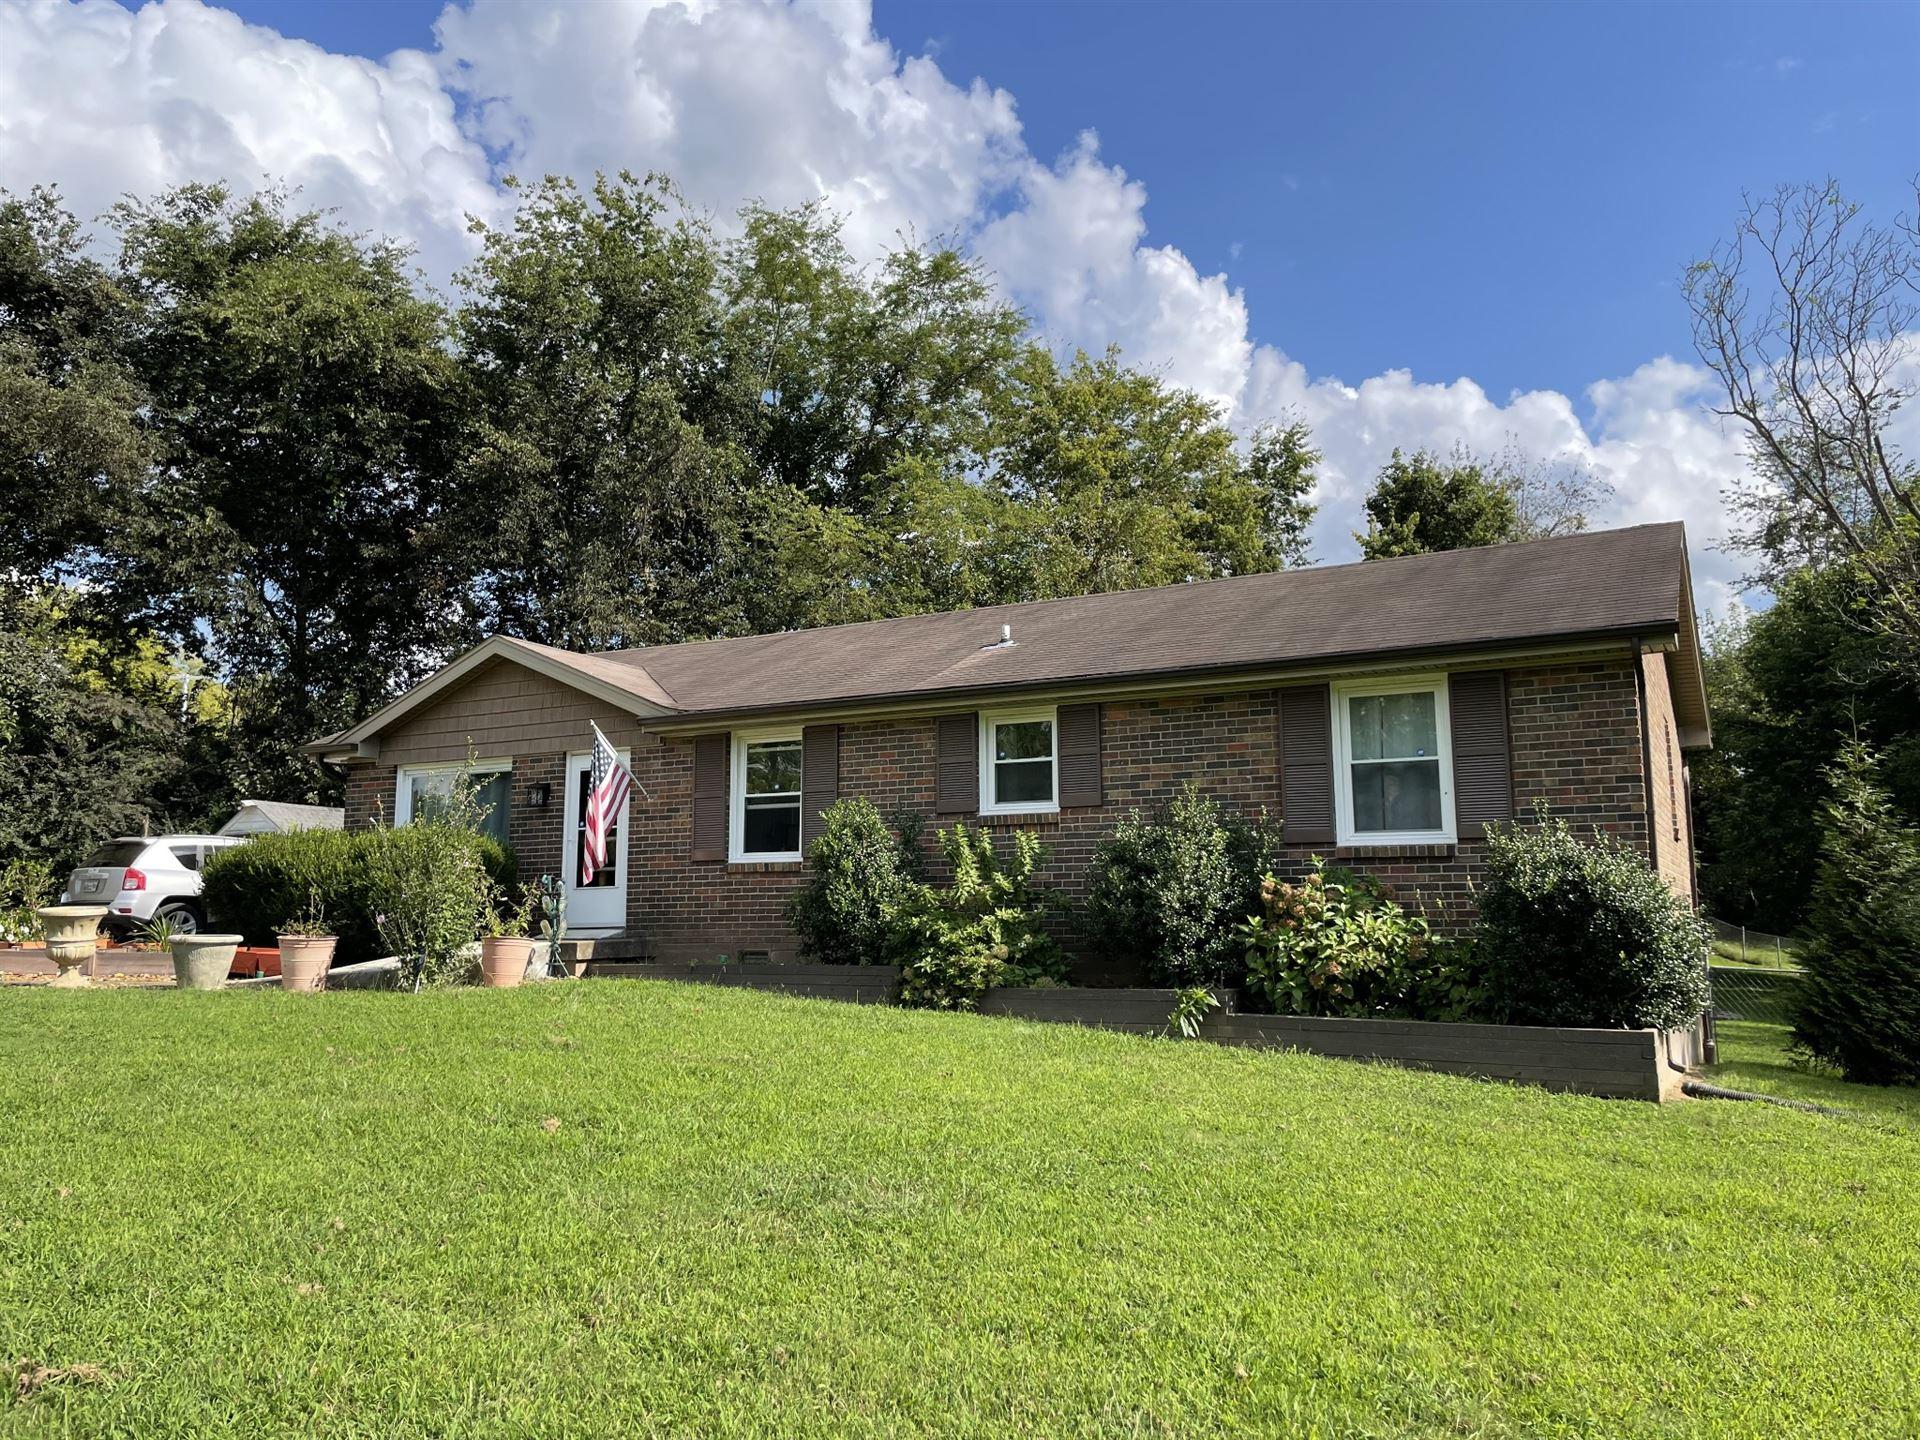 860 Pollard Rd, Clarksville, TN 37042 - MLS#: 2290760